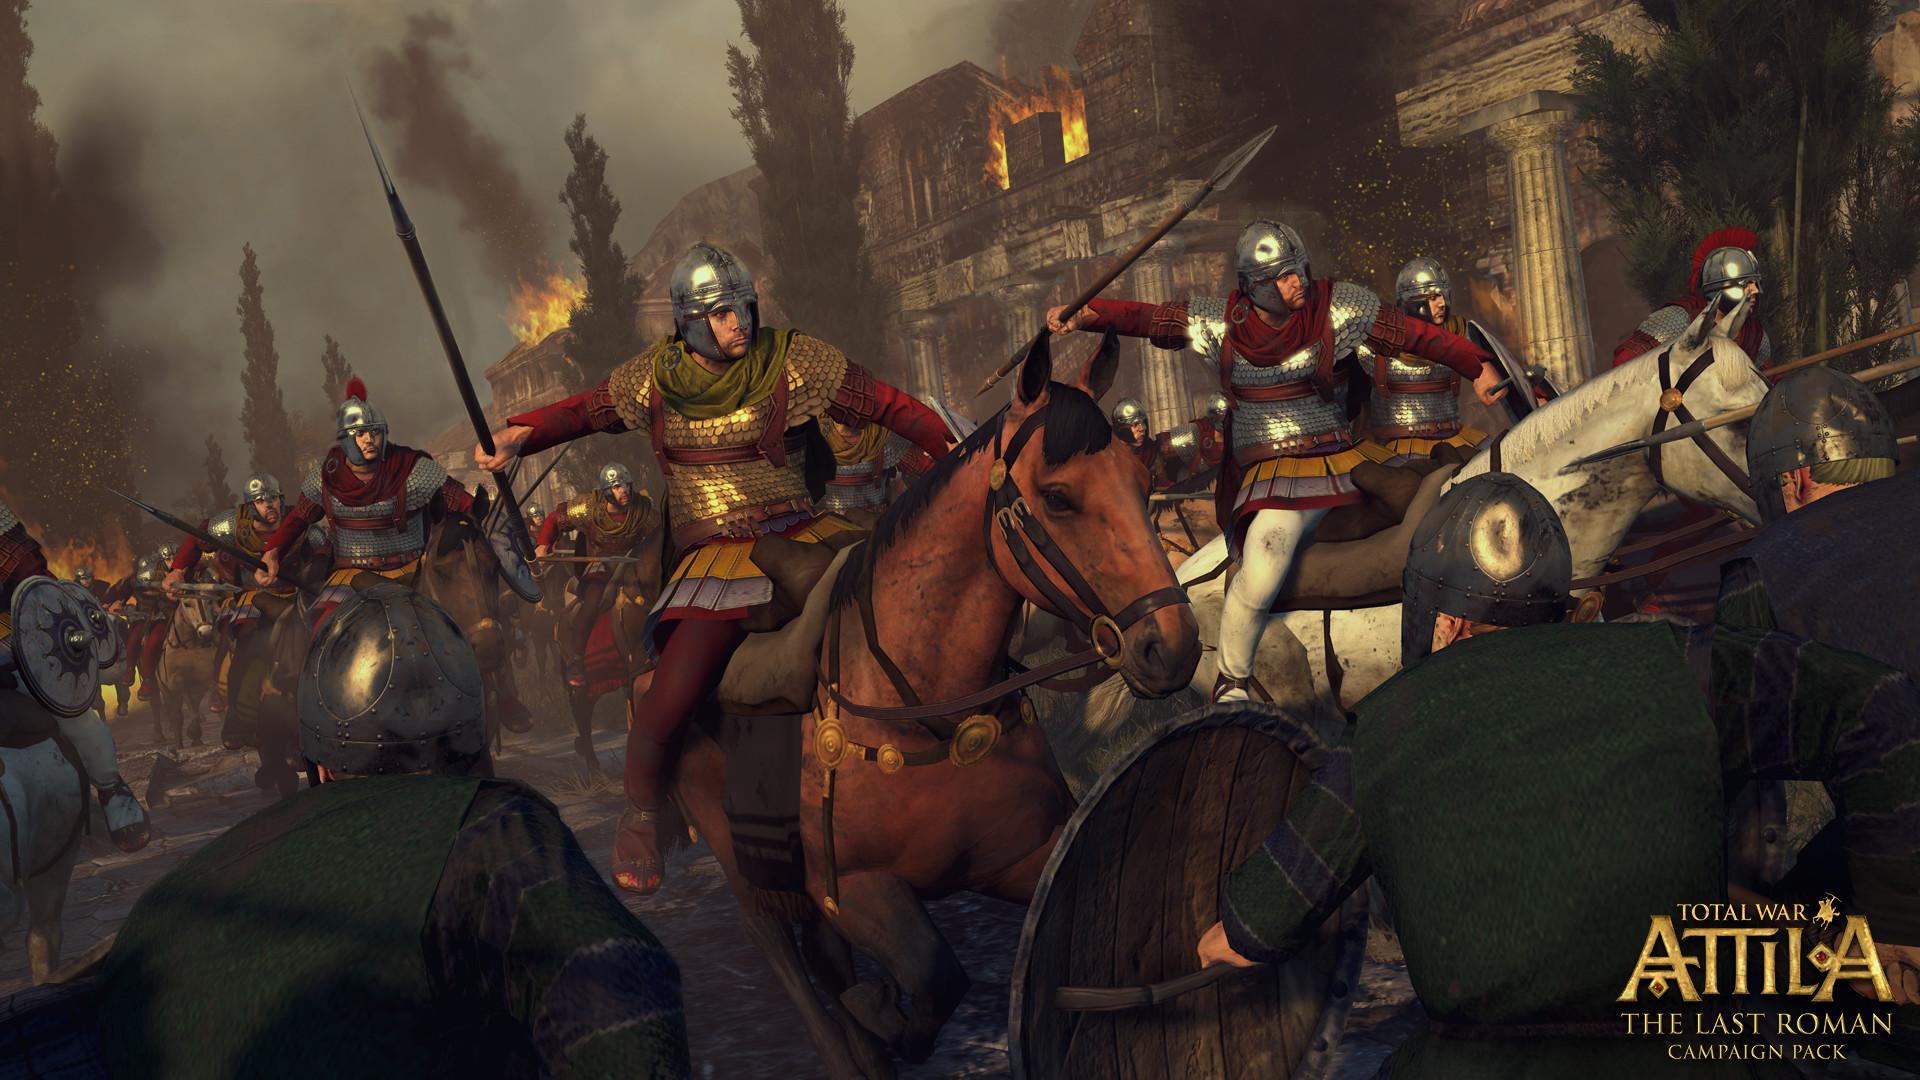 Total War: ATTILA - The Last Roman Campaign Pack PC Key Fiyatları